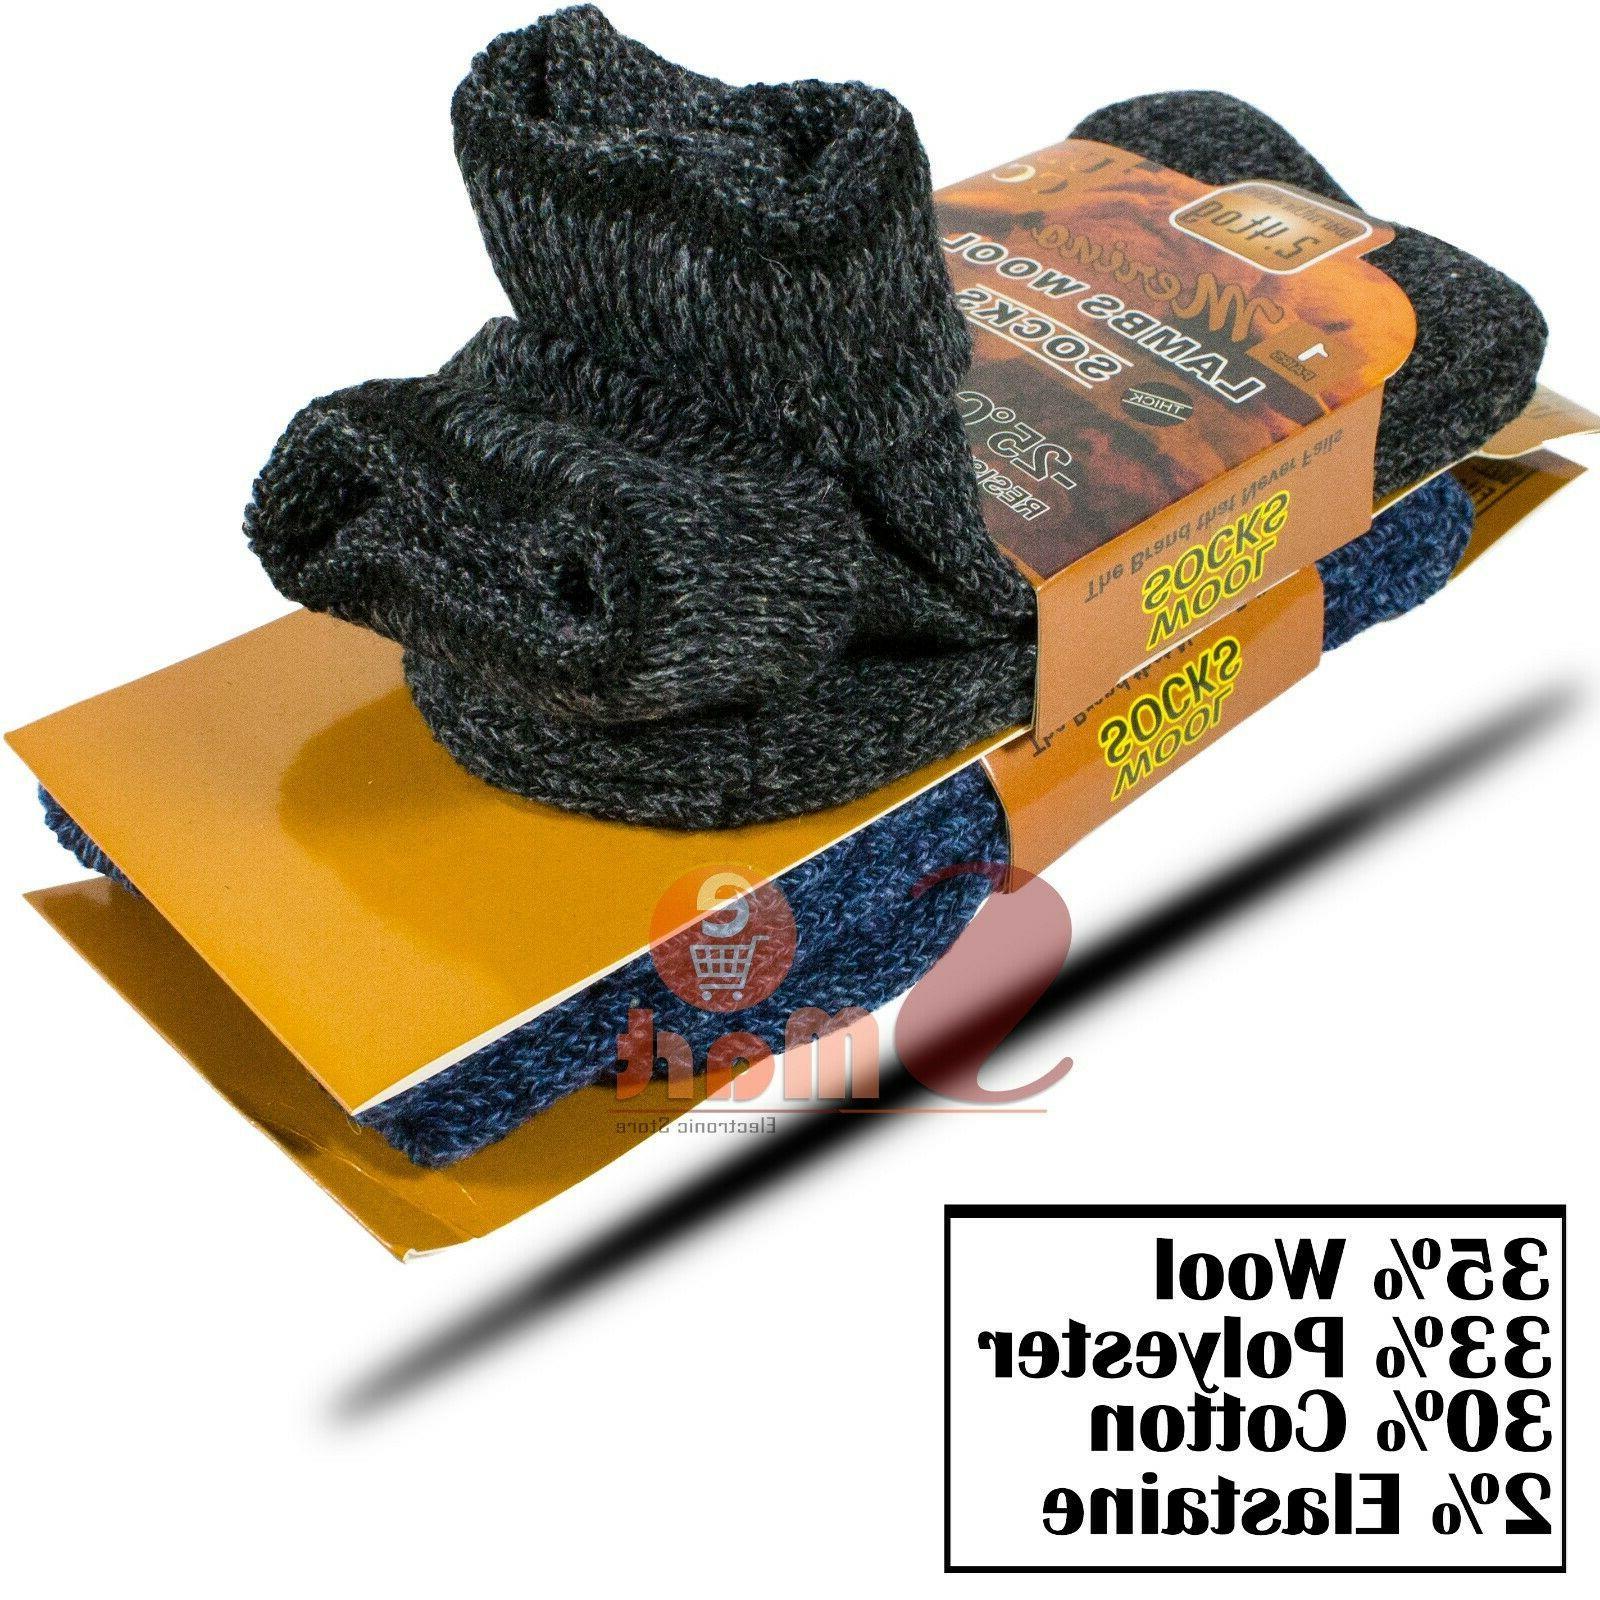 3 Winter Merino Lambs Wool Heavy Duty Thermal Boots Mens 10-13